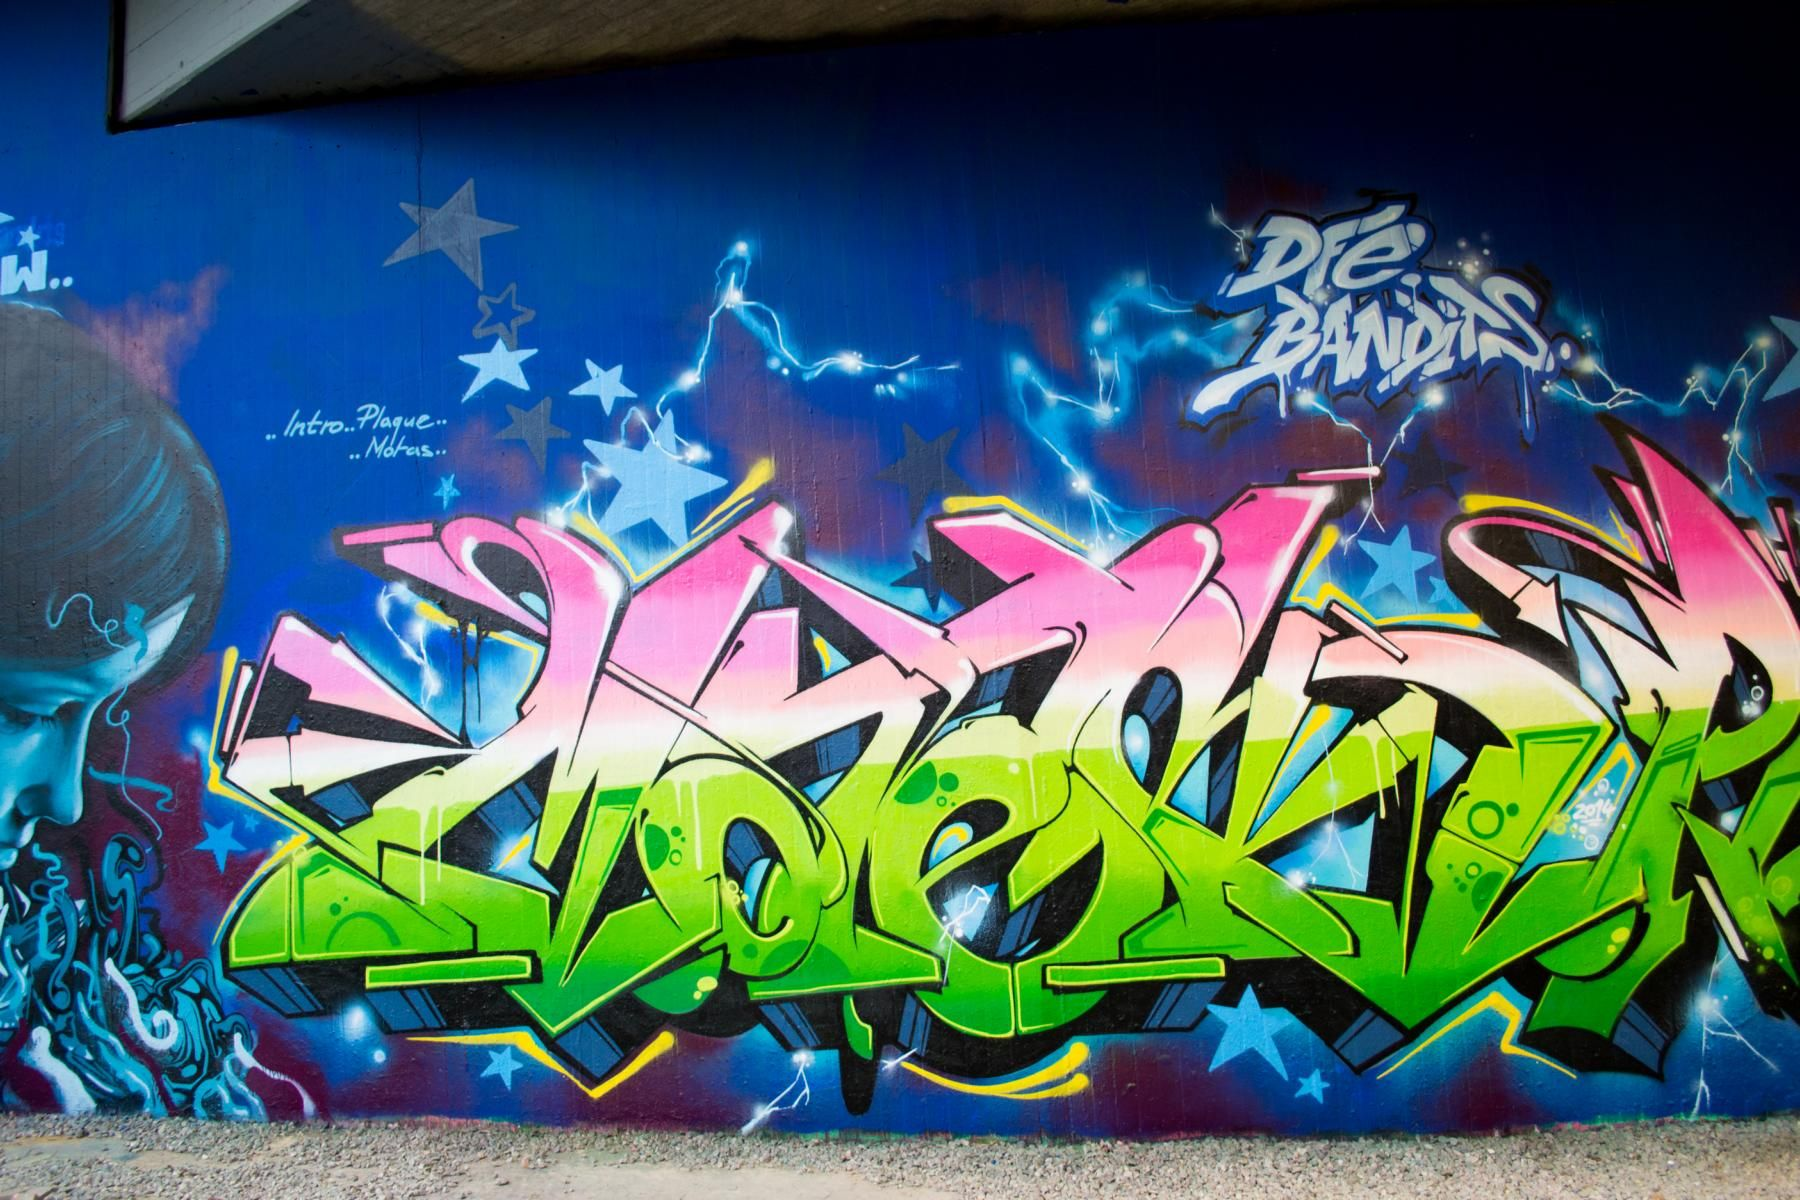 TOPTEN - Gris | Graffiti, Juxtapoz, Art